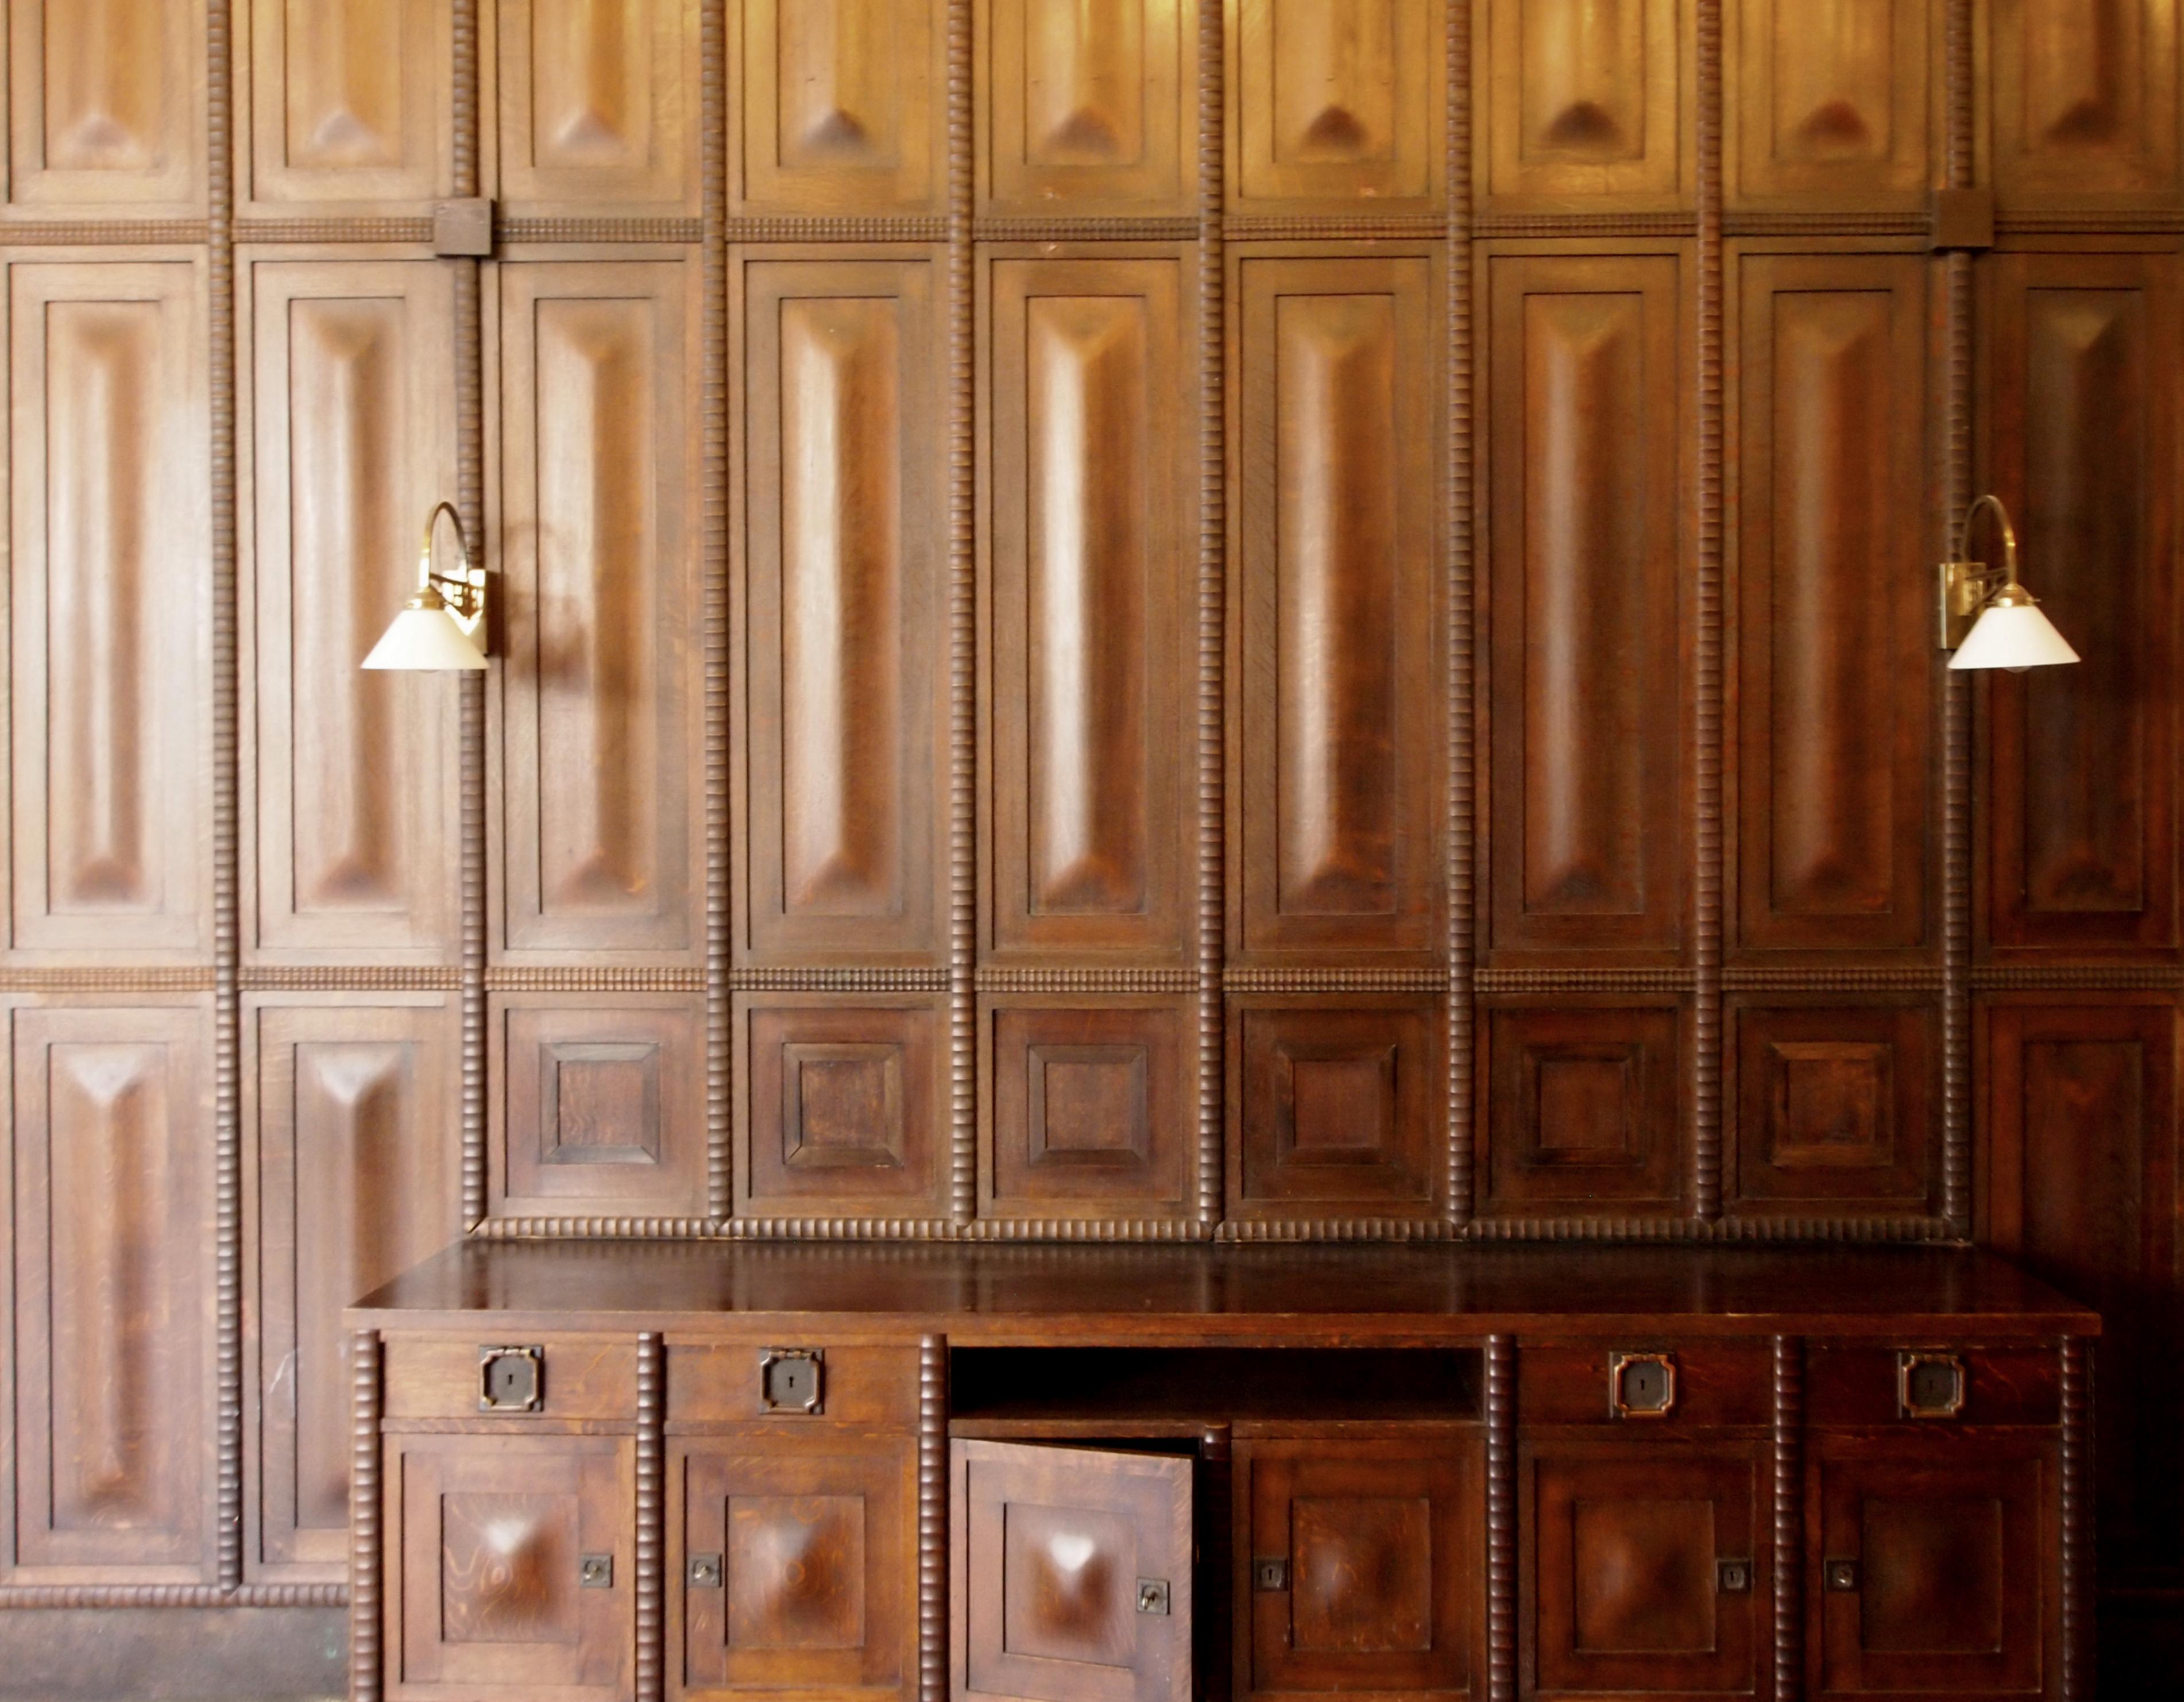 file 1130 wien auhofstr 15 villa wustl interieur